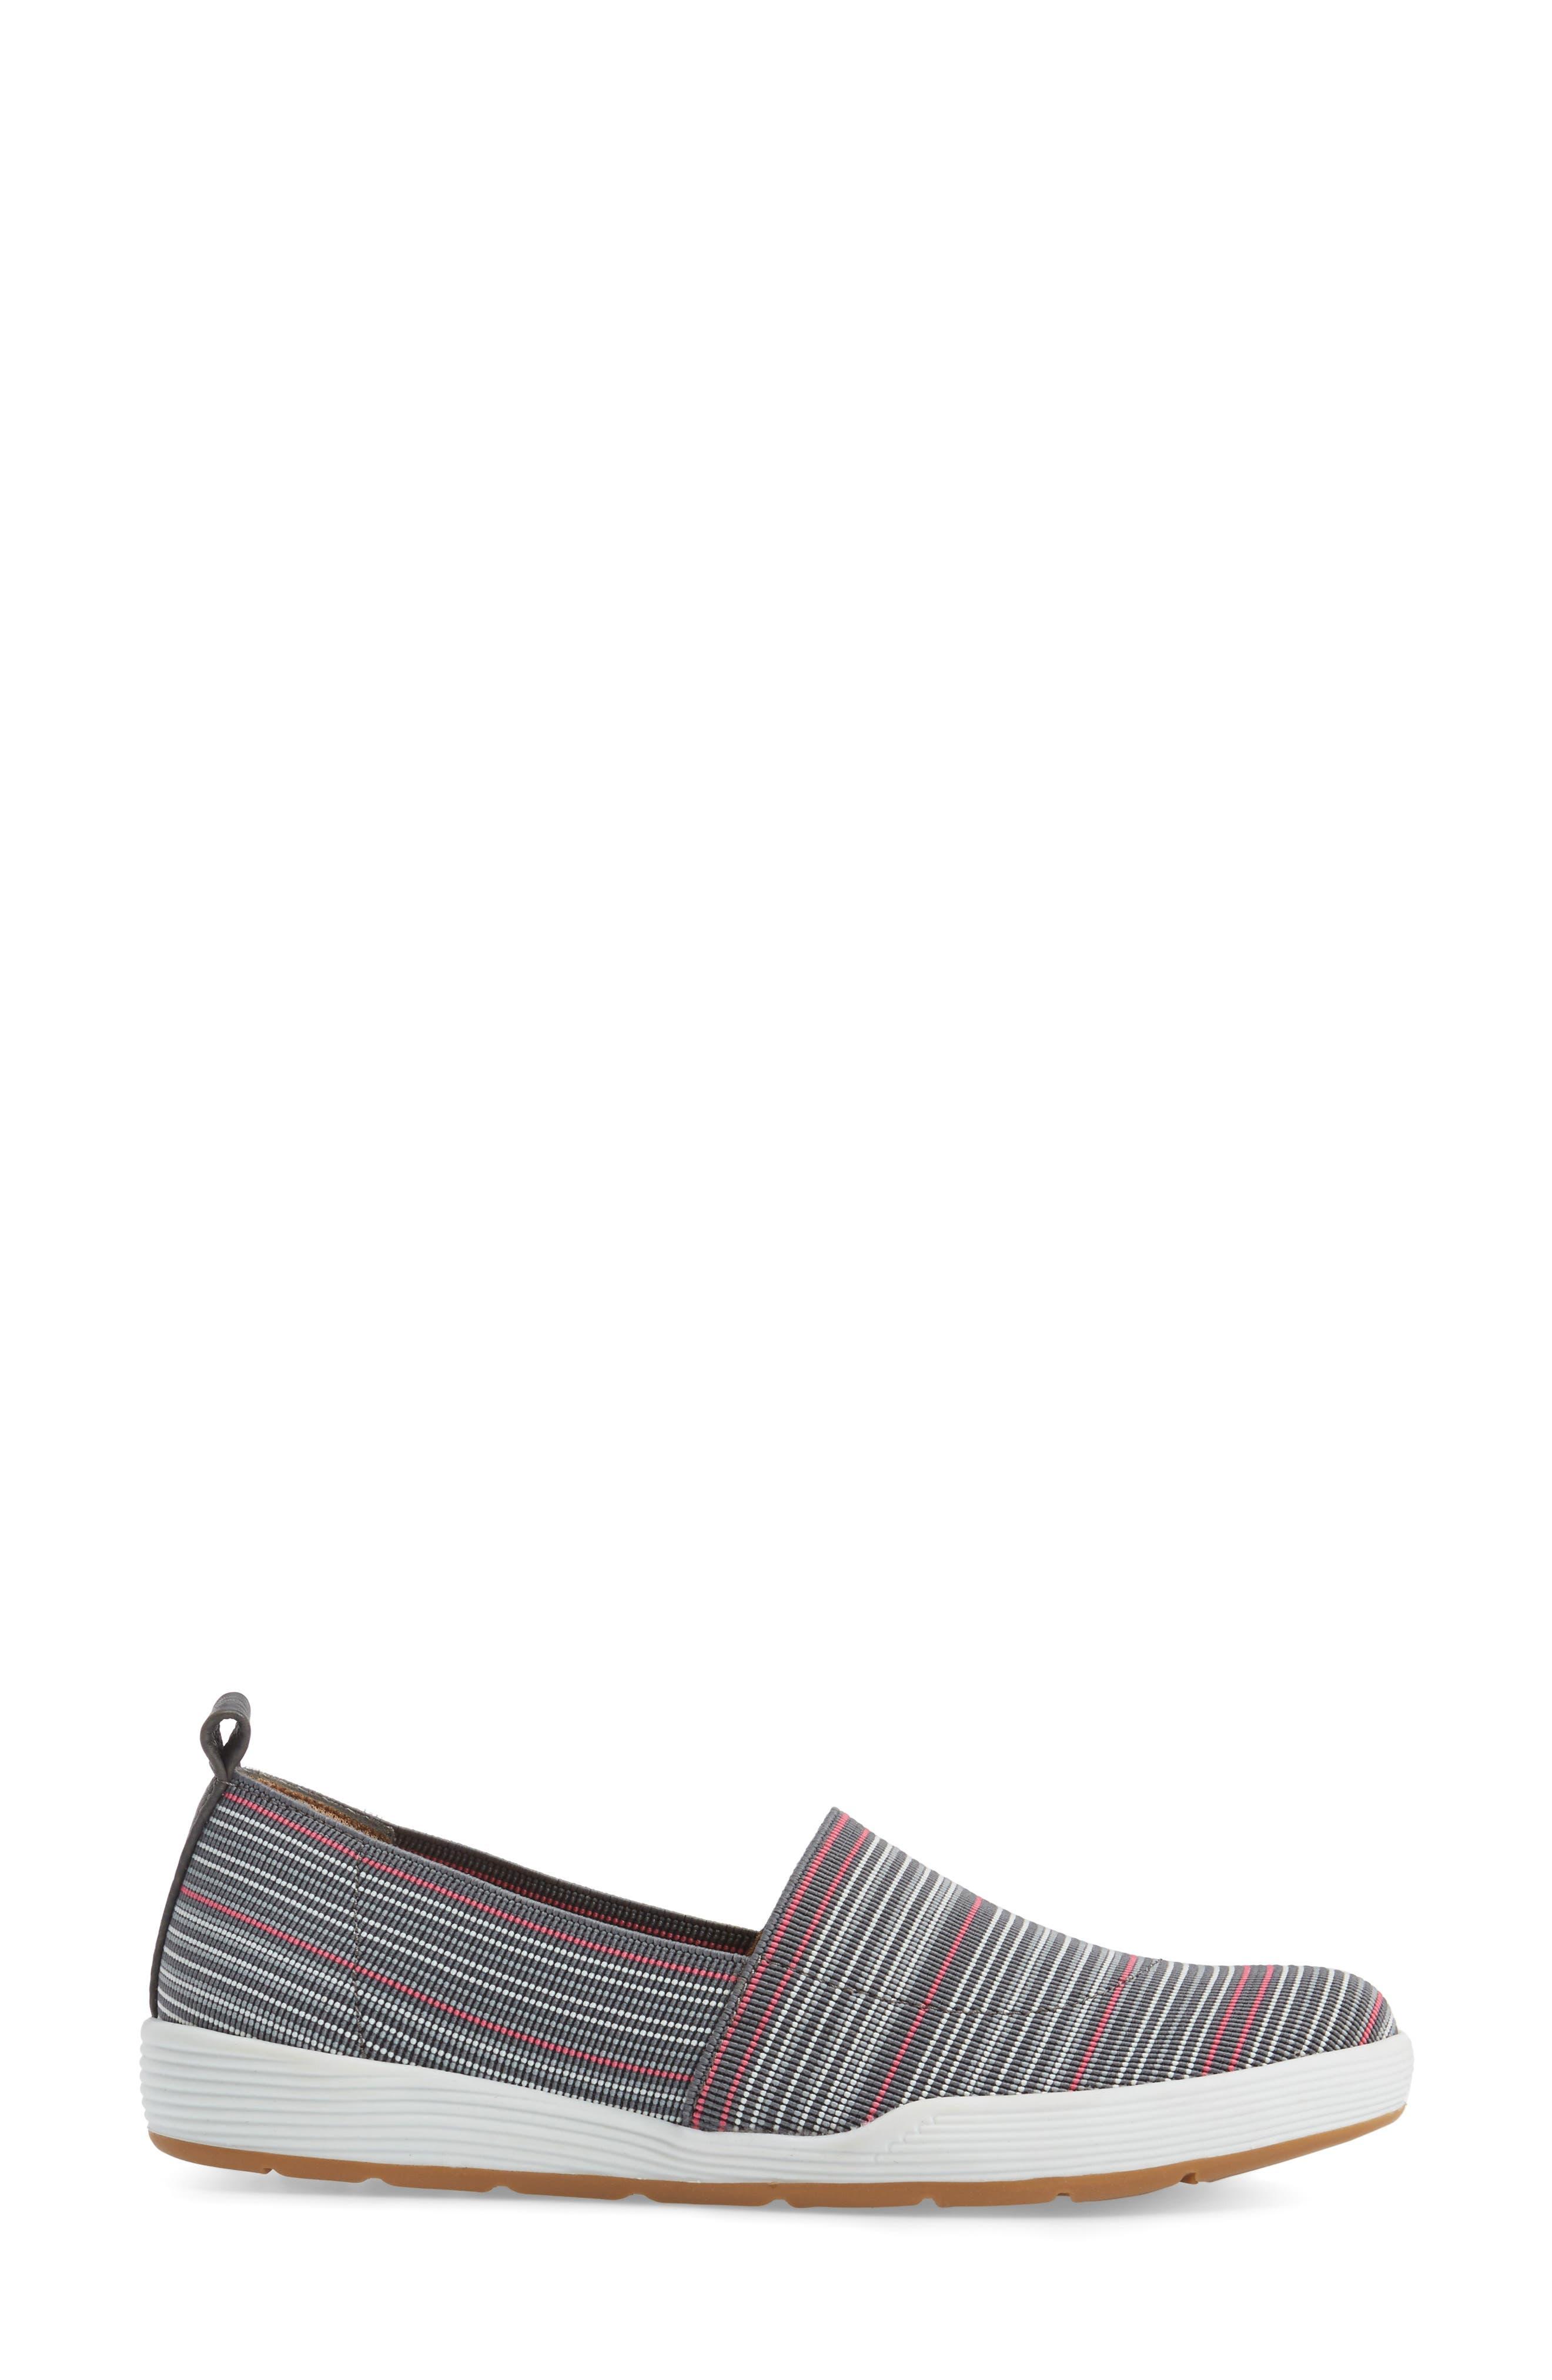 Lida Slip-On Flat,                             Alternate thumbnail 10, color,